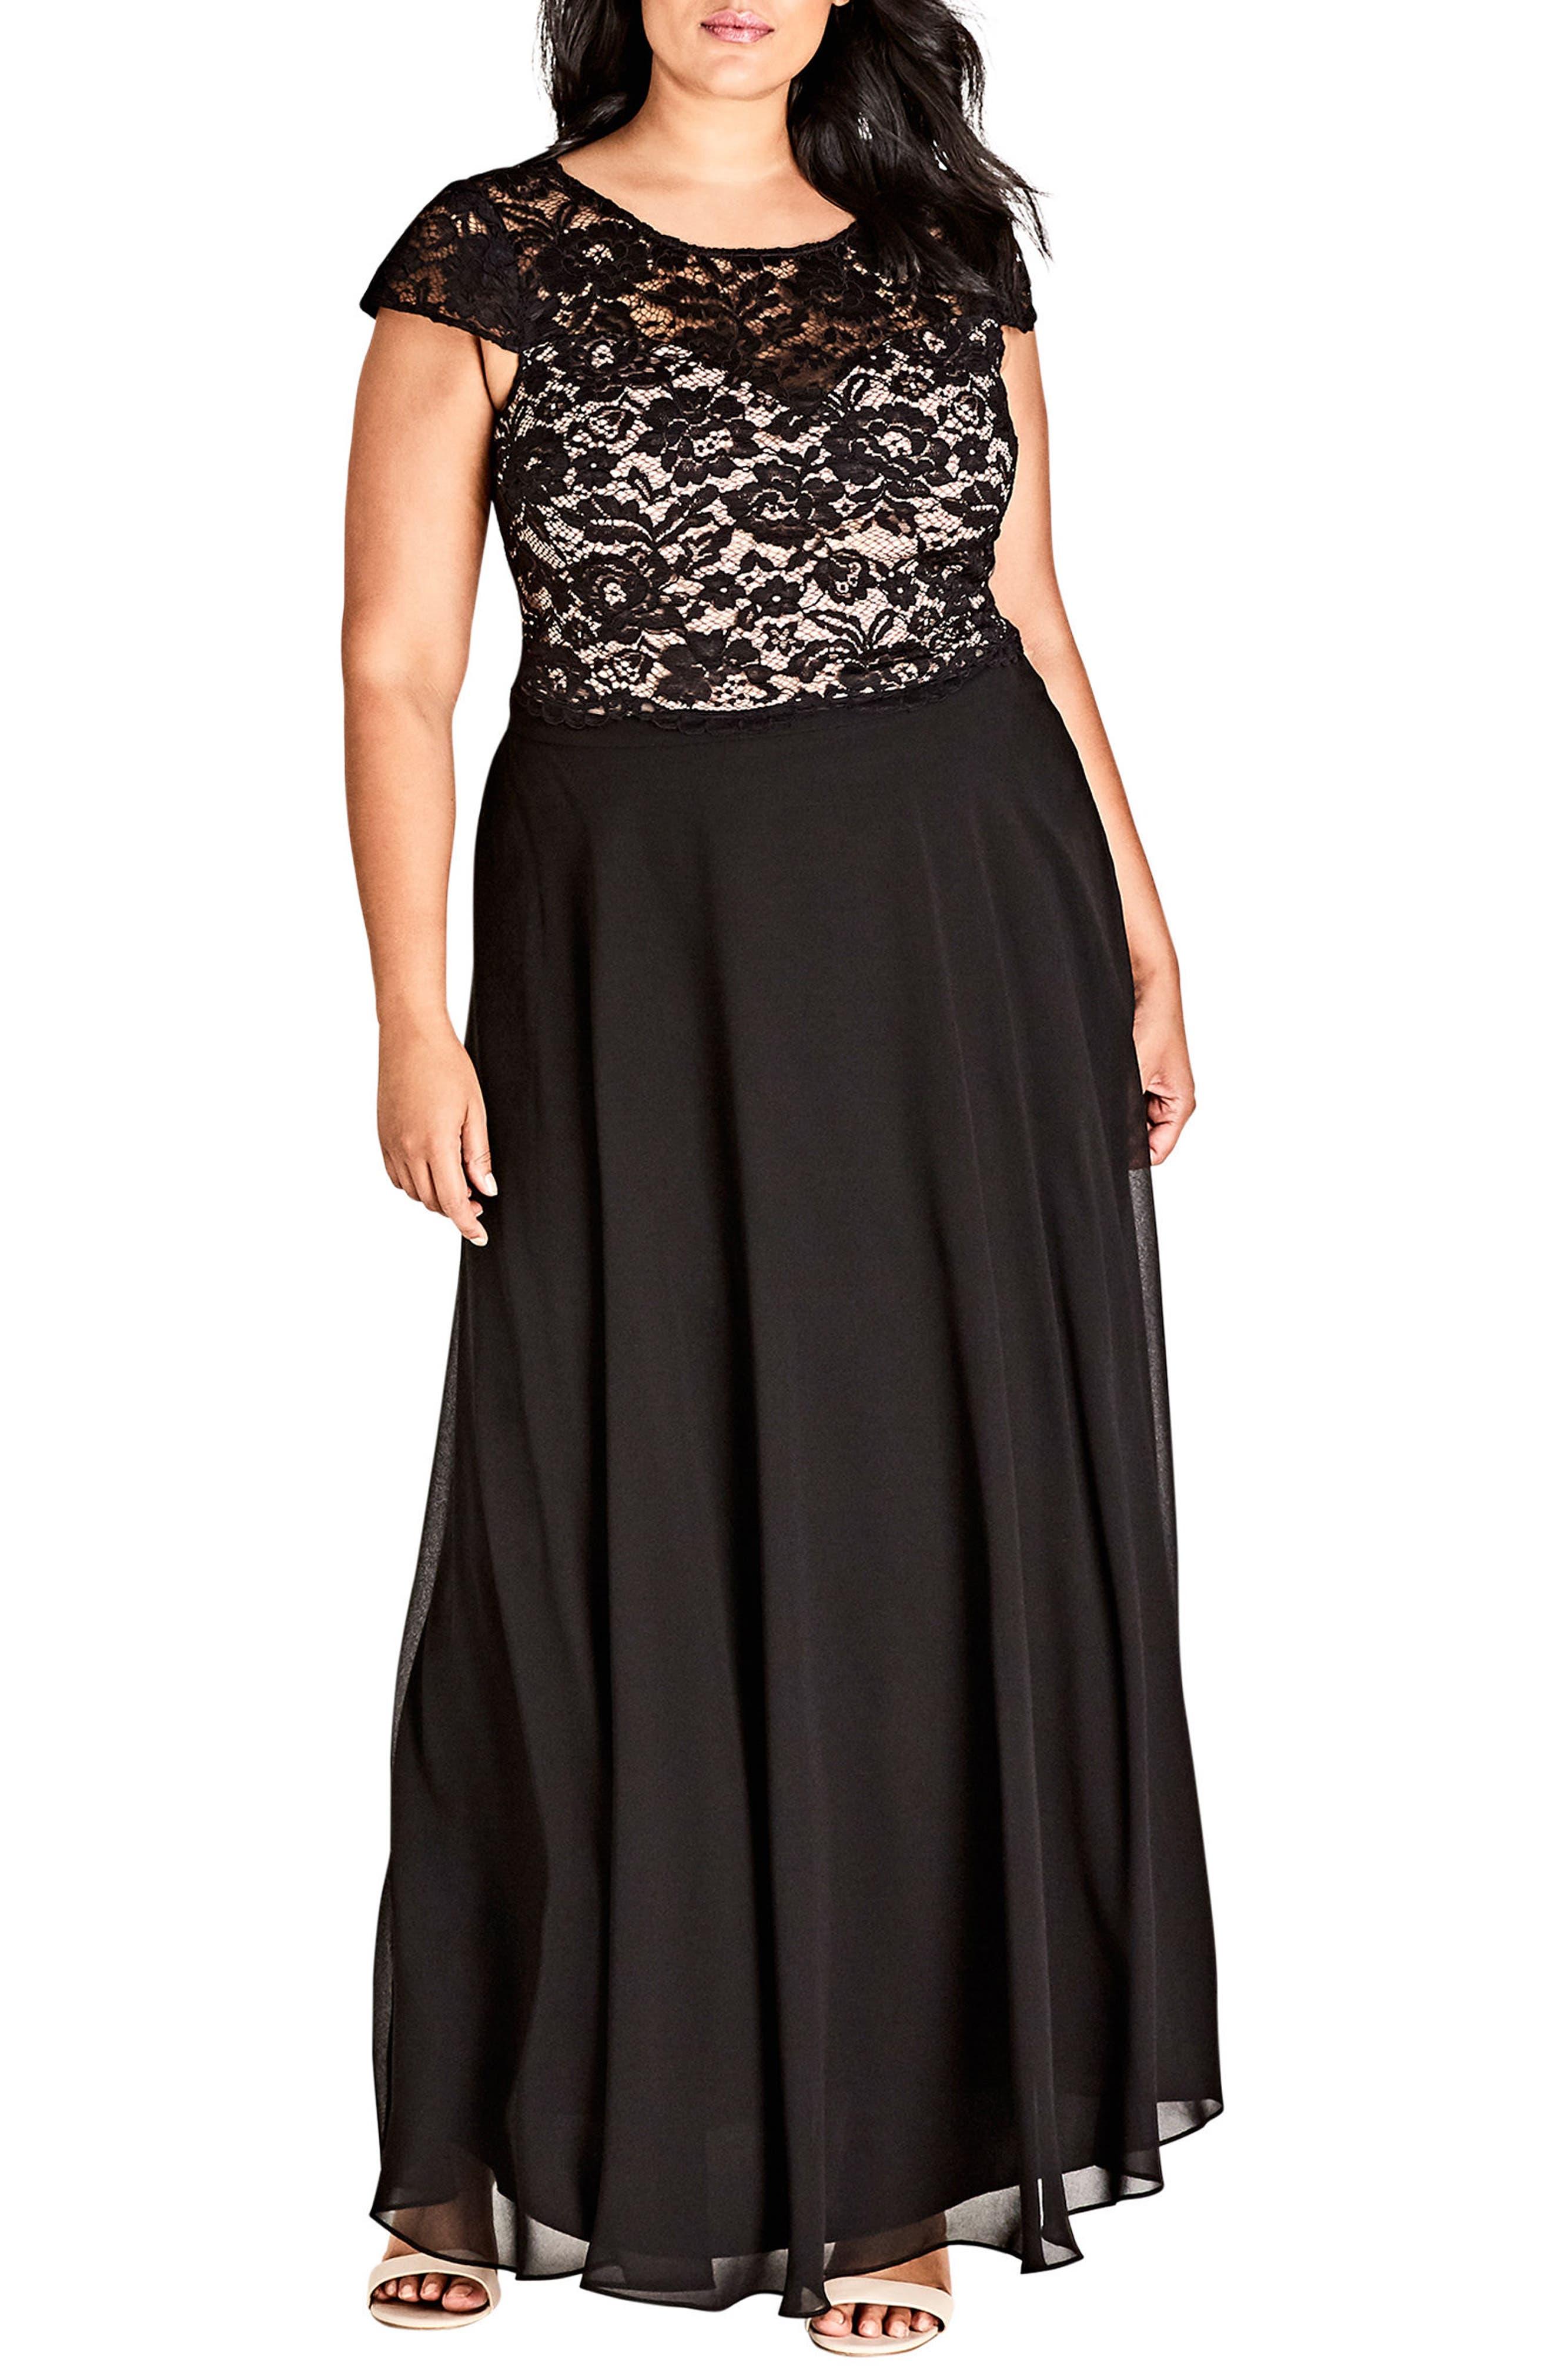 Main Image - City Chic Elegance Maxi Dress Set (Plus Size)